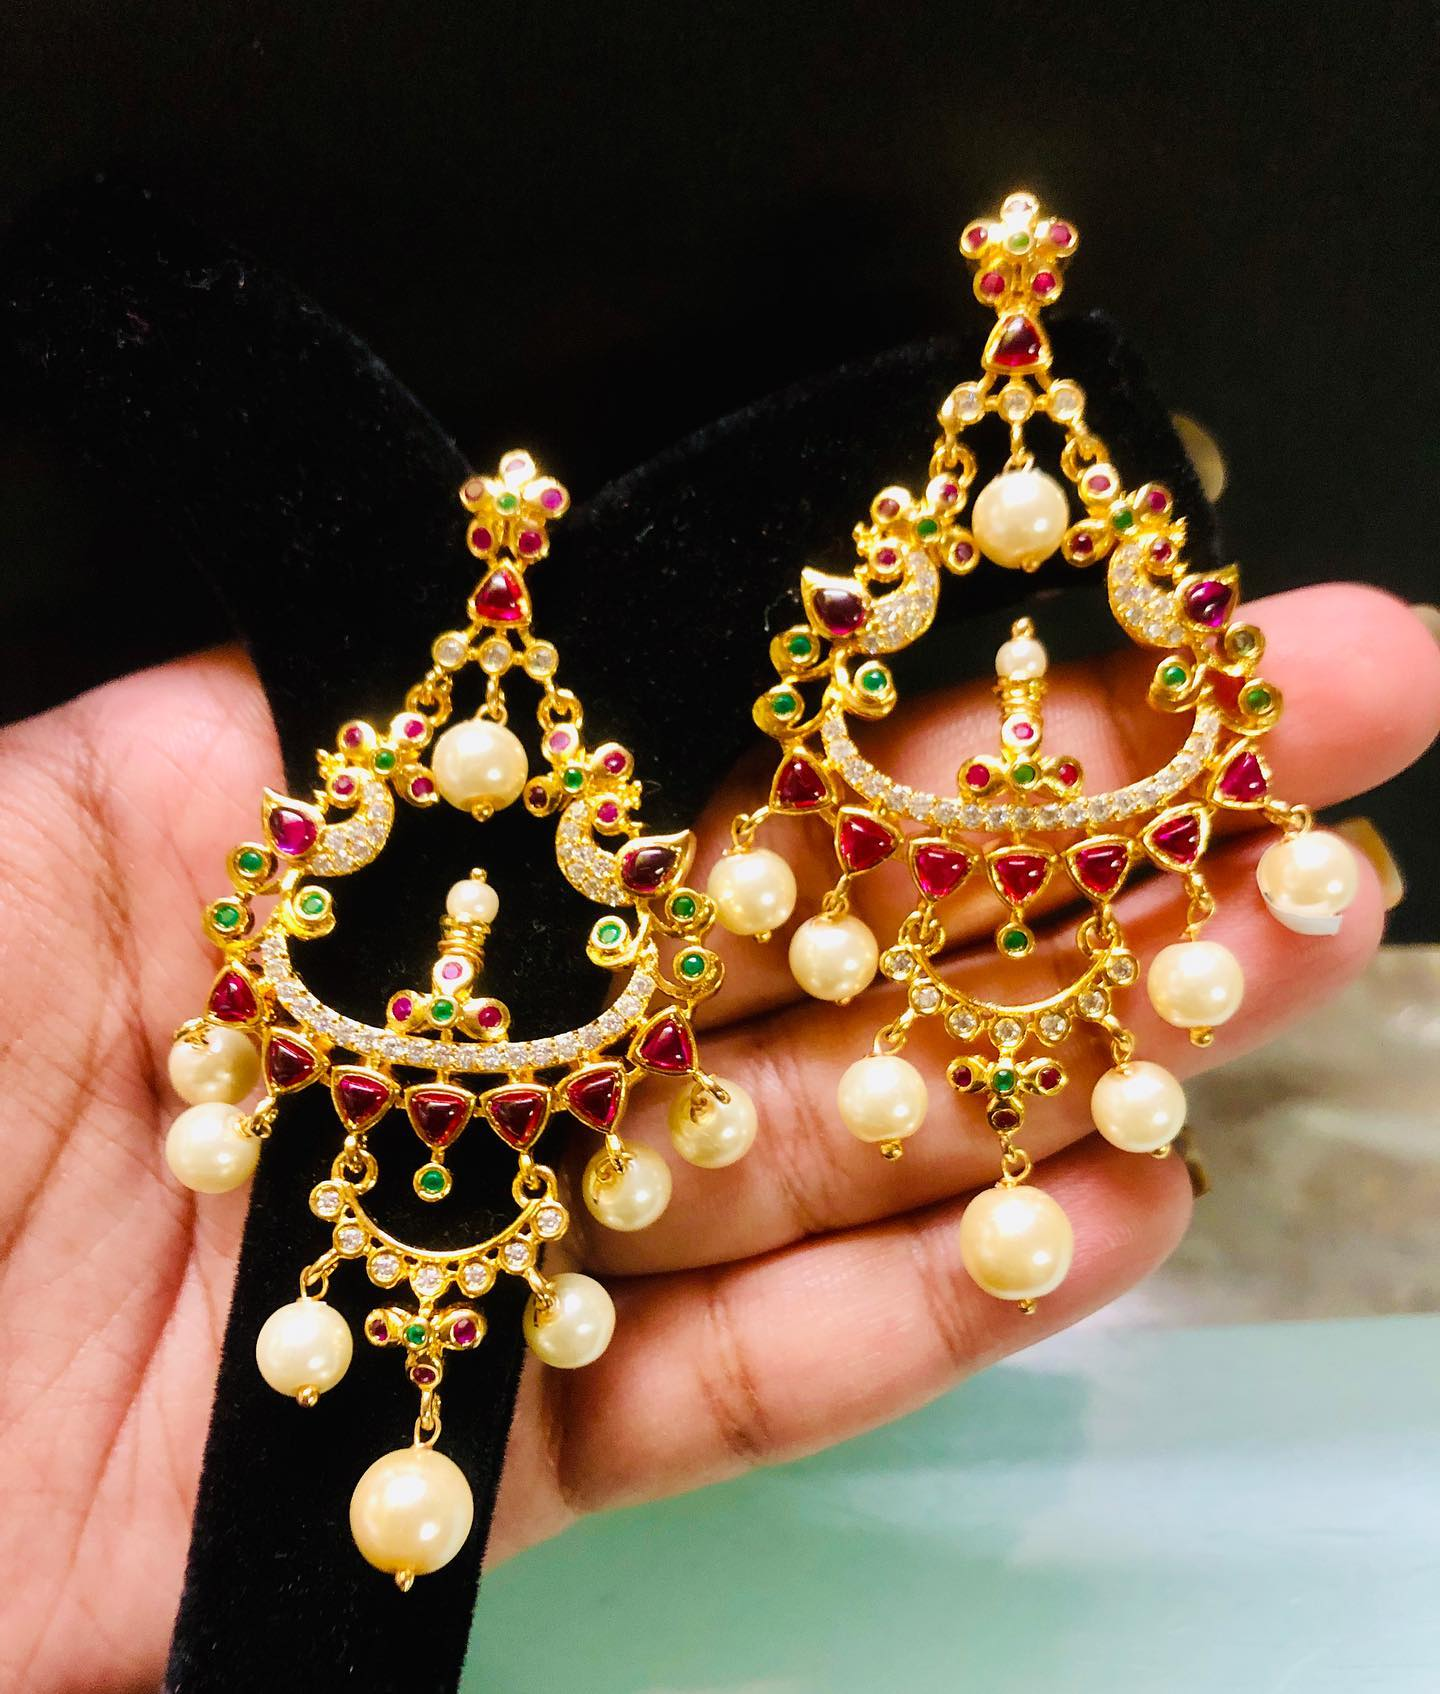 one gram gold Chandbalis. To order whatsapp me on 8978304347